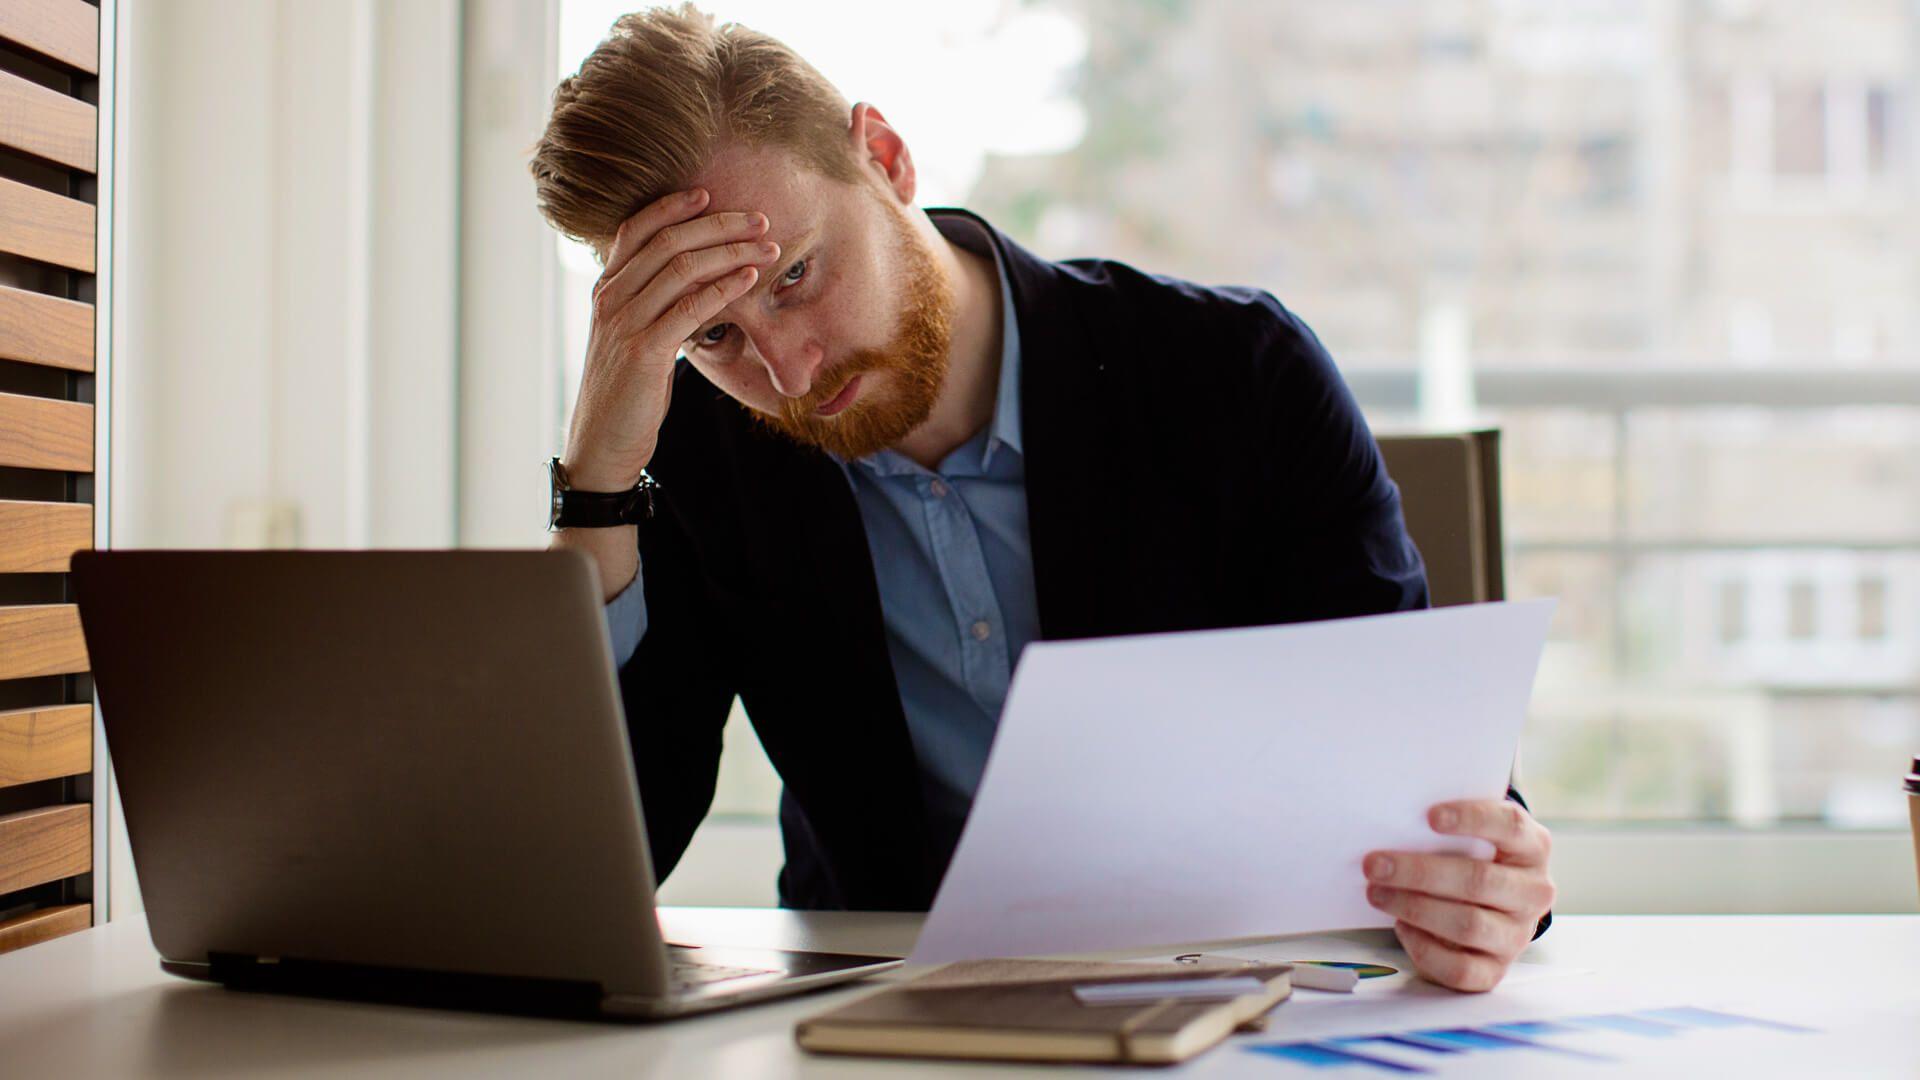 Young businessman under stress.